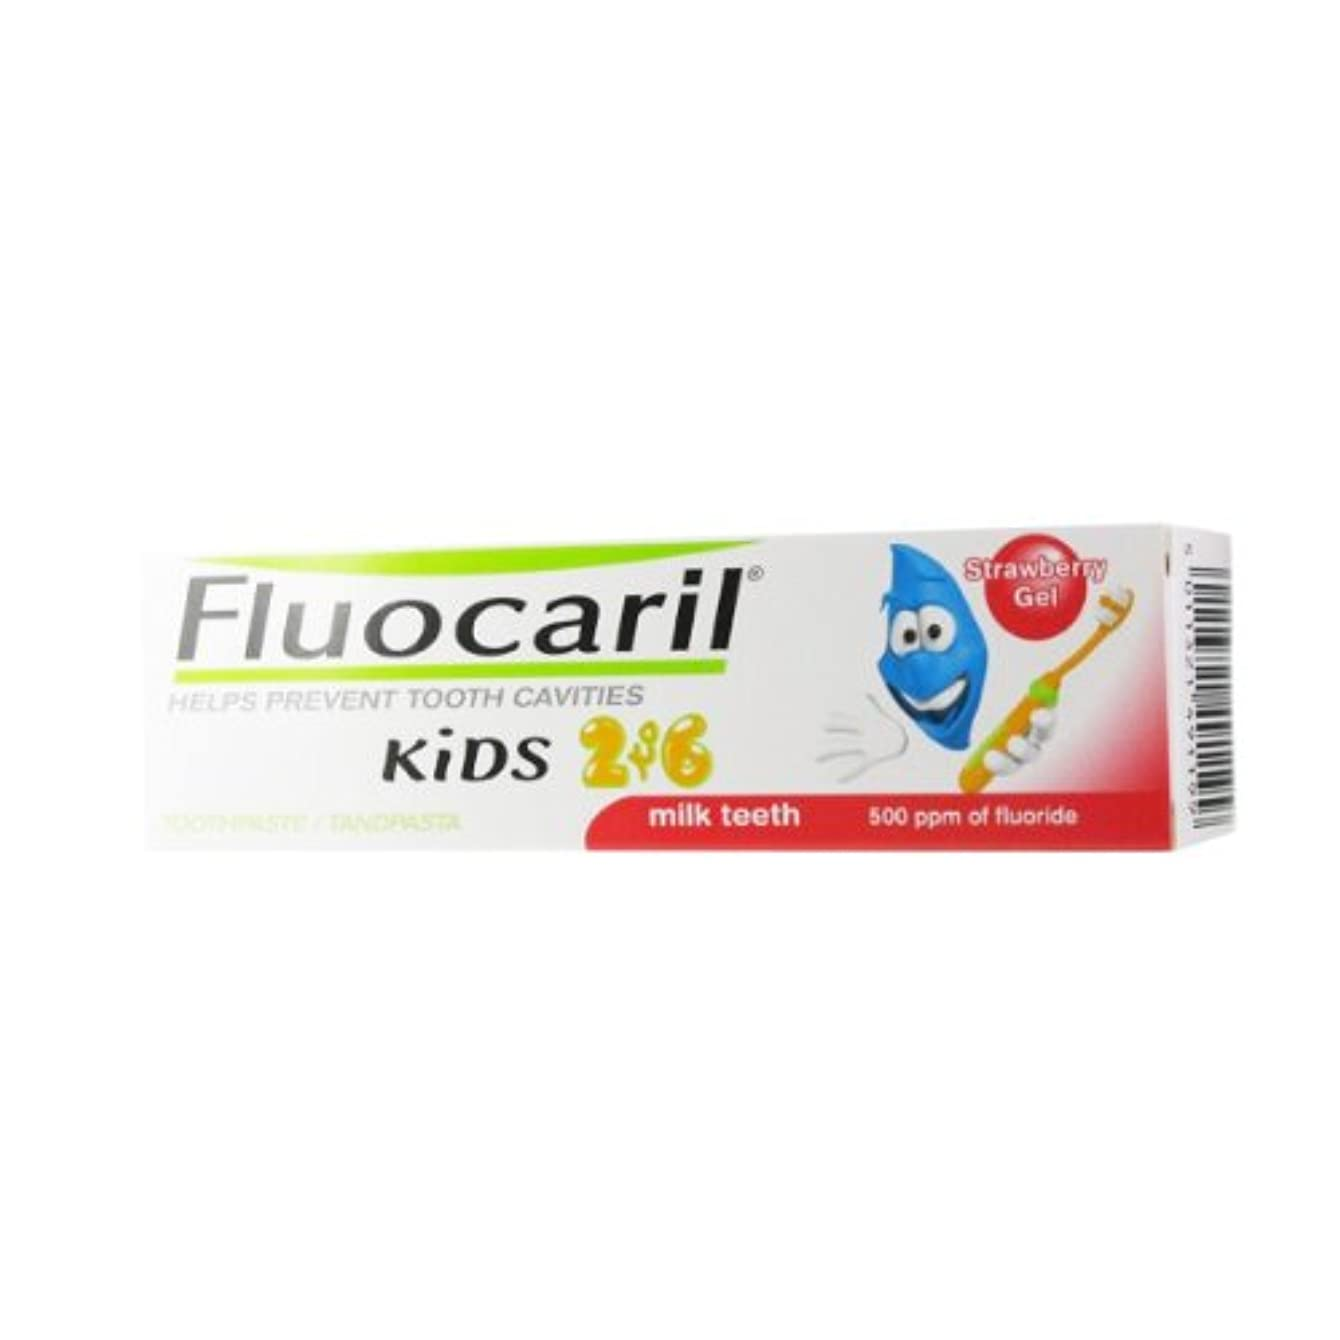 Fluocaril Kids 2 To 6 Strawberry Gel 50ml [並行輸入品]